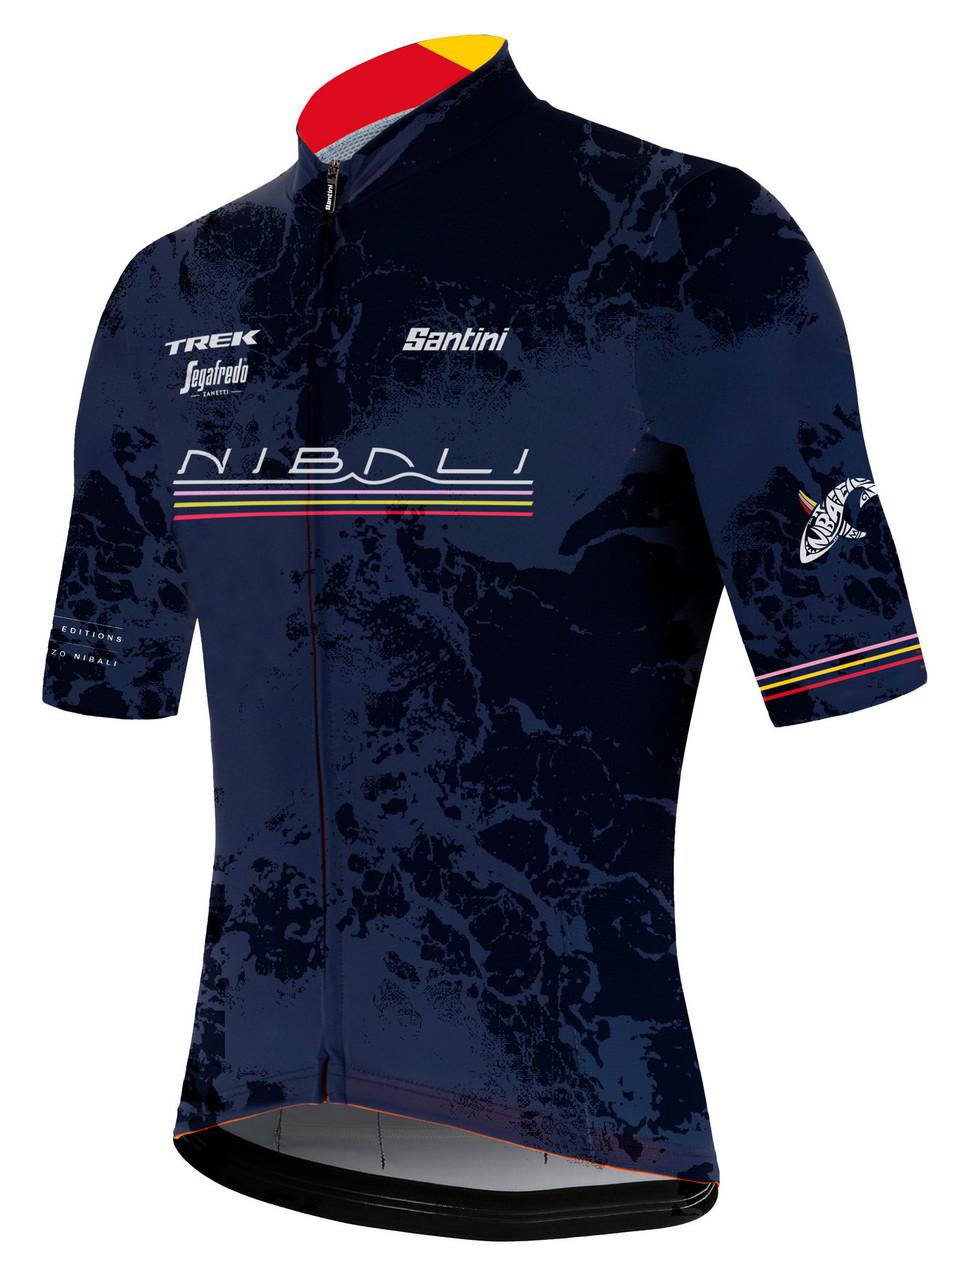 2020 Trek Nibili Shark Jersey